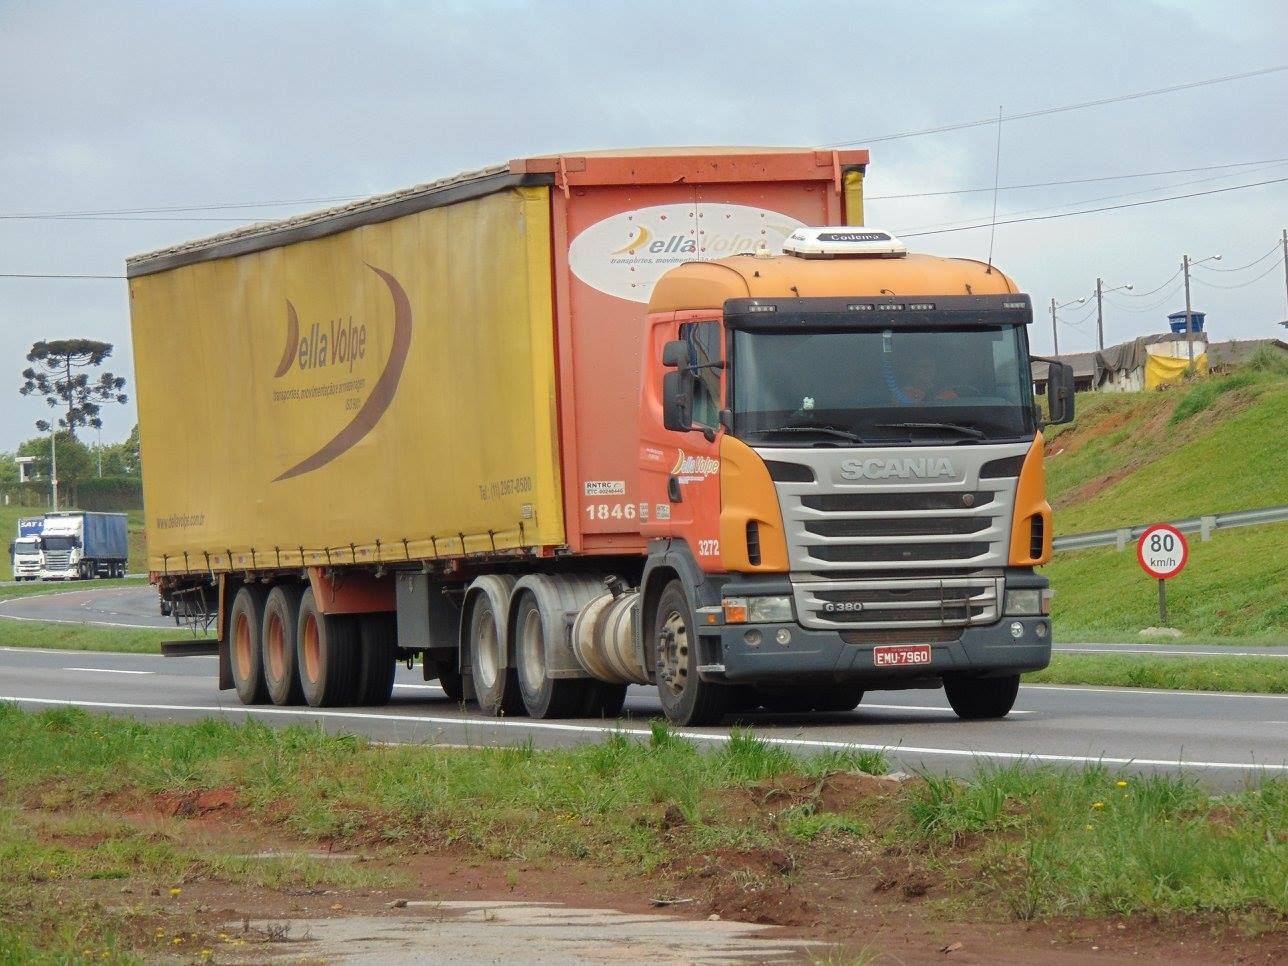 Scania-photo-5-1--2015-11